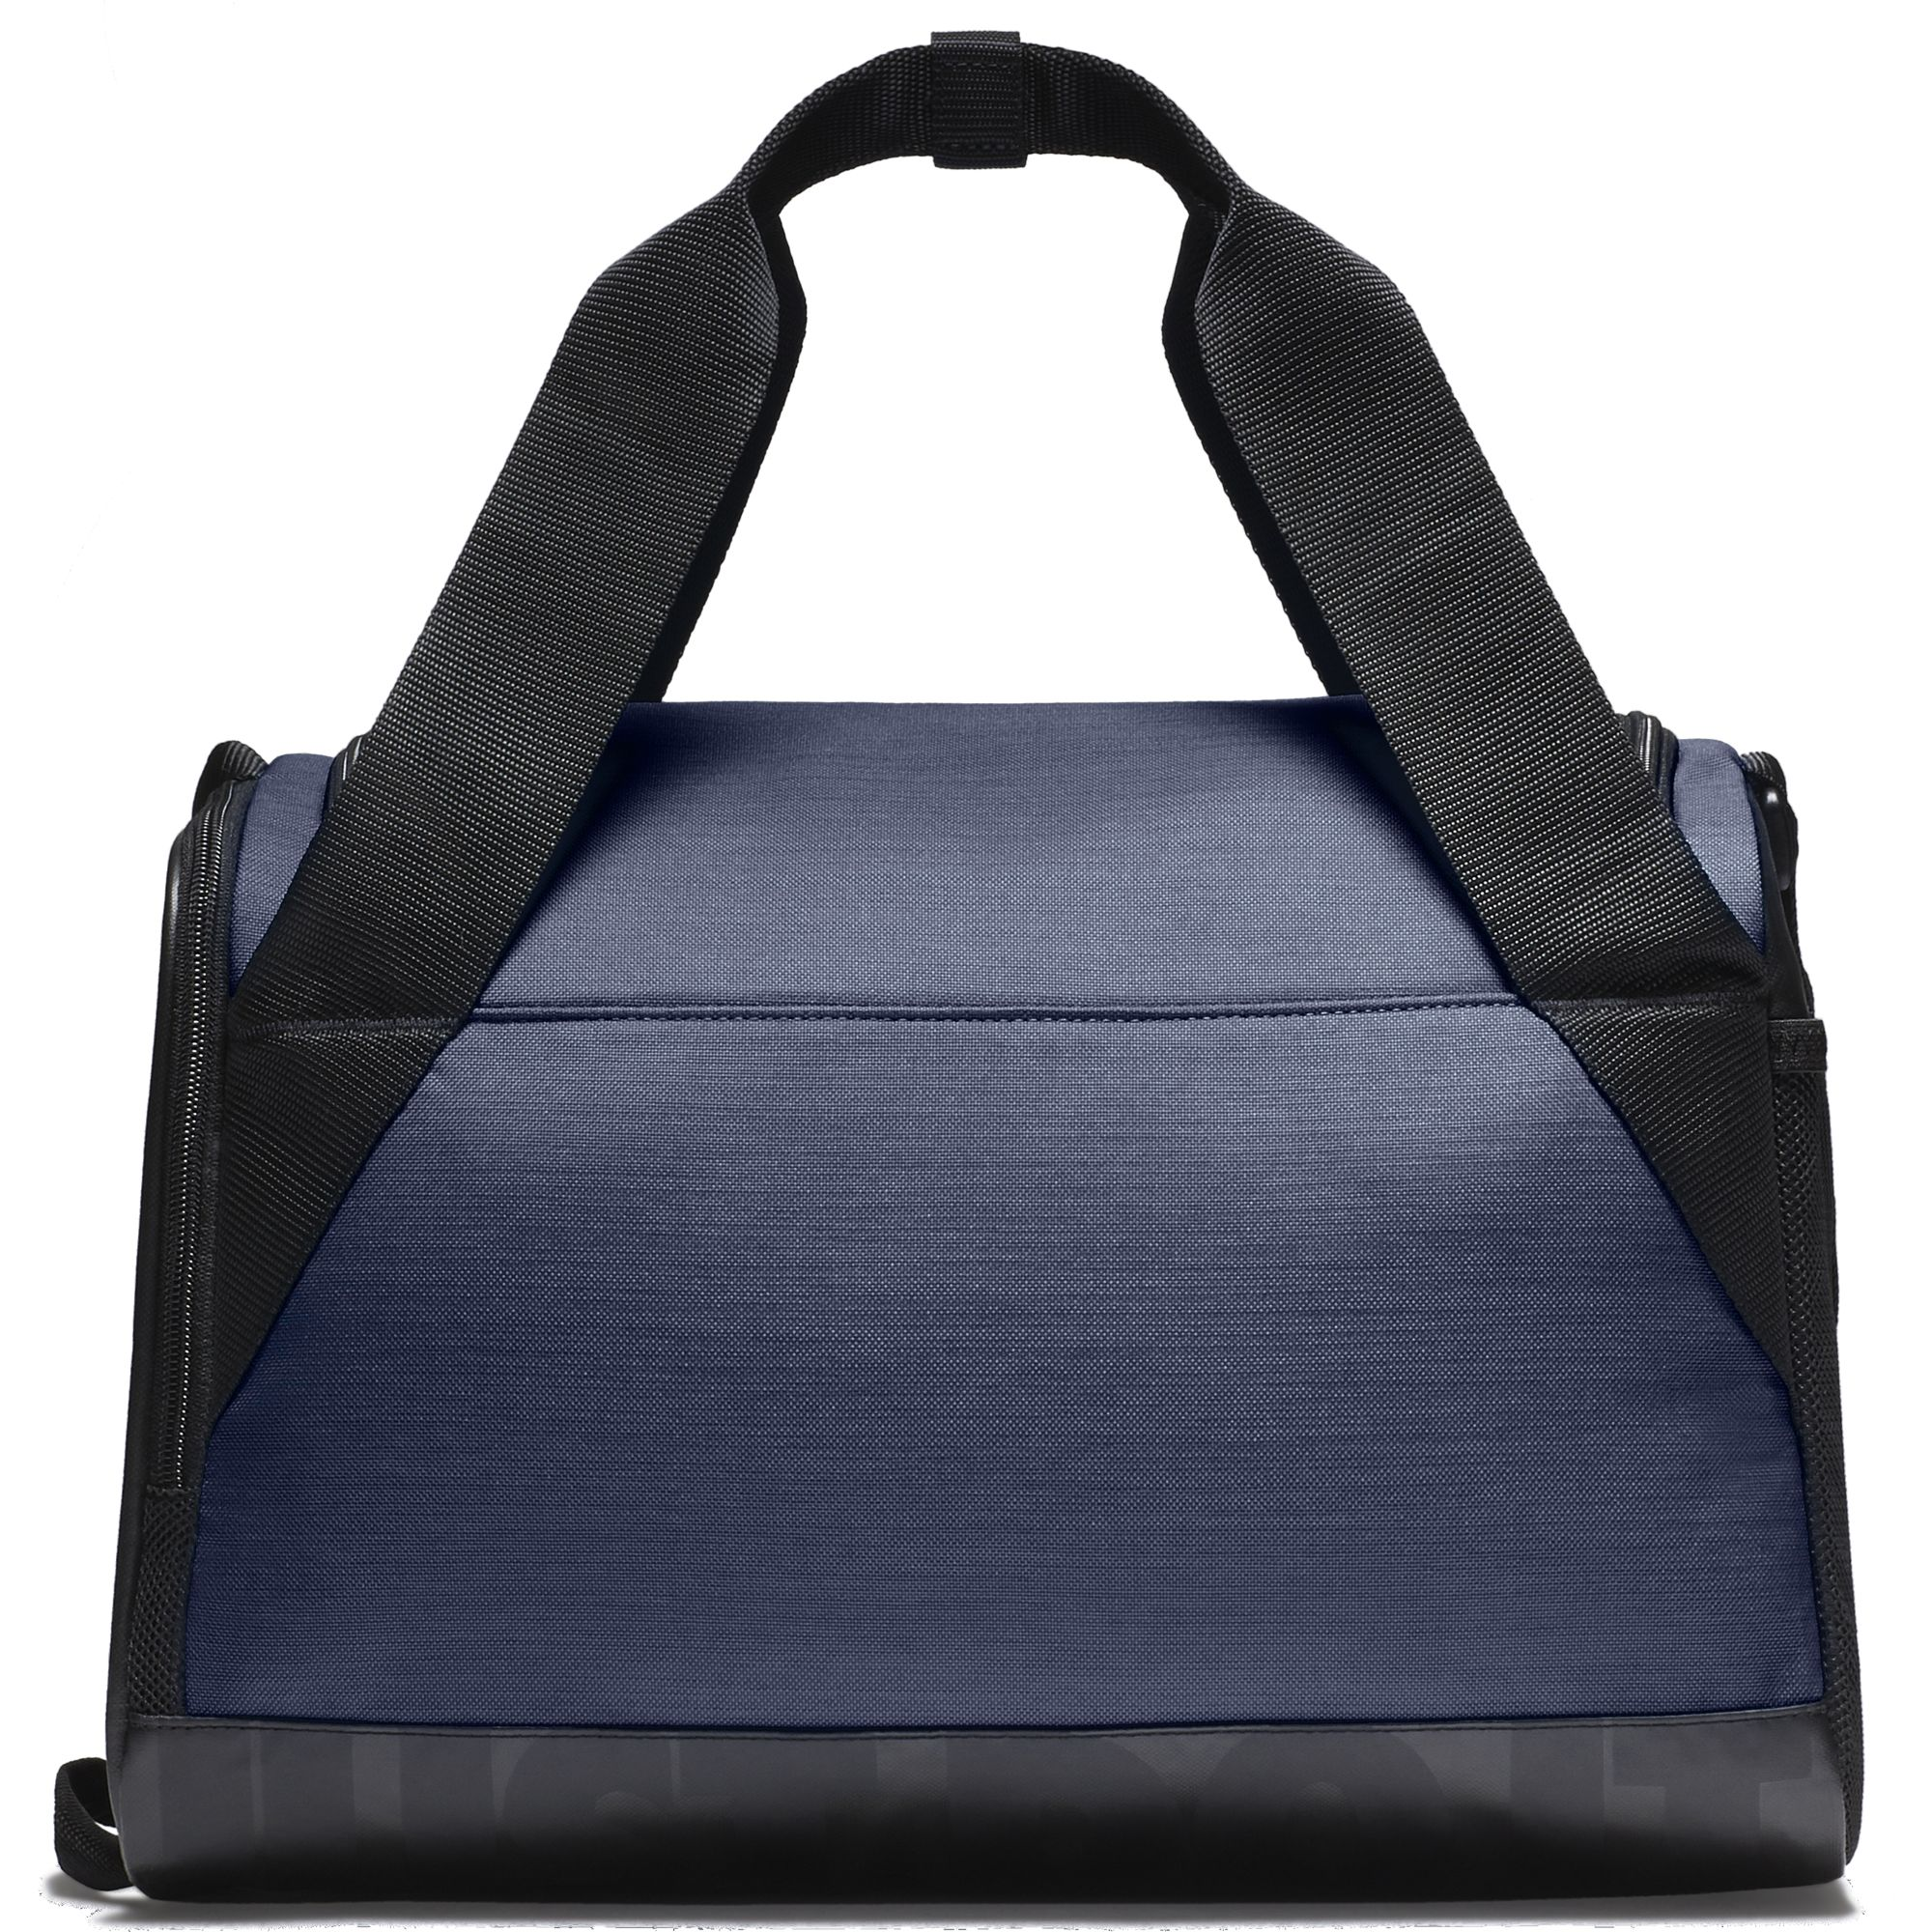 b3fa641cdcb84 ... torba Nike Brasilia (Extra-Small) Duffel Bag BA5432 410 ...